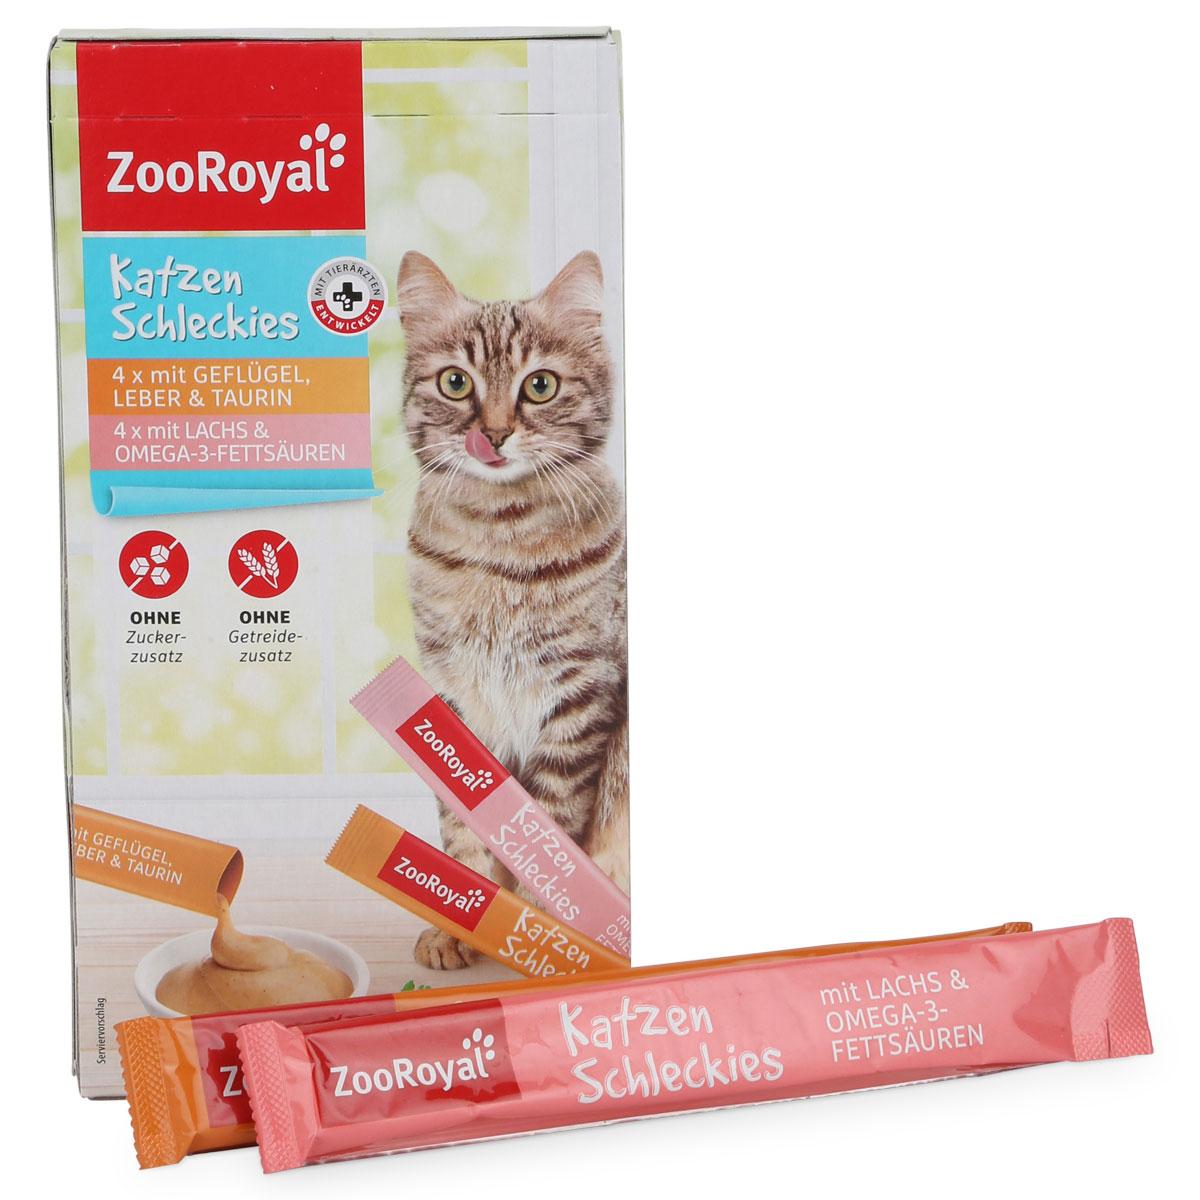 zooroyal katzen schleckies g nstig kaufen bei zooroyal. Black Bedroom Furniture Sets. Home Design Ideas